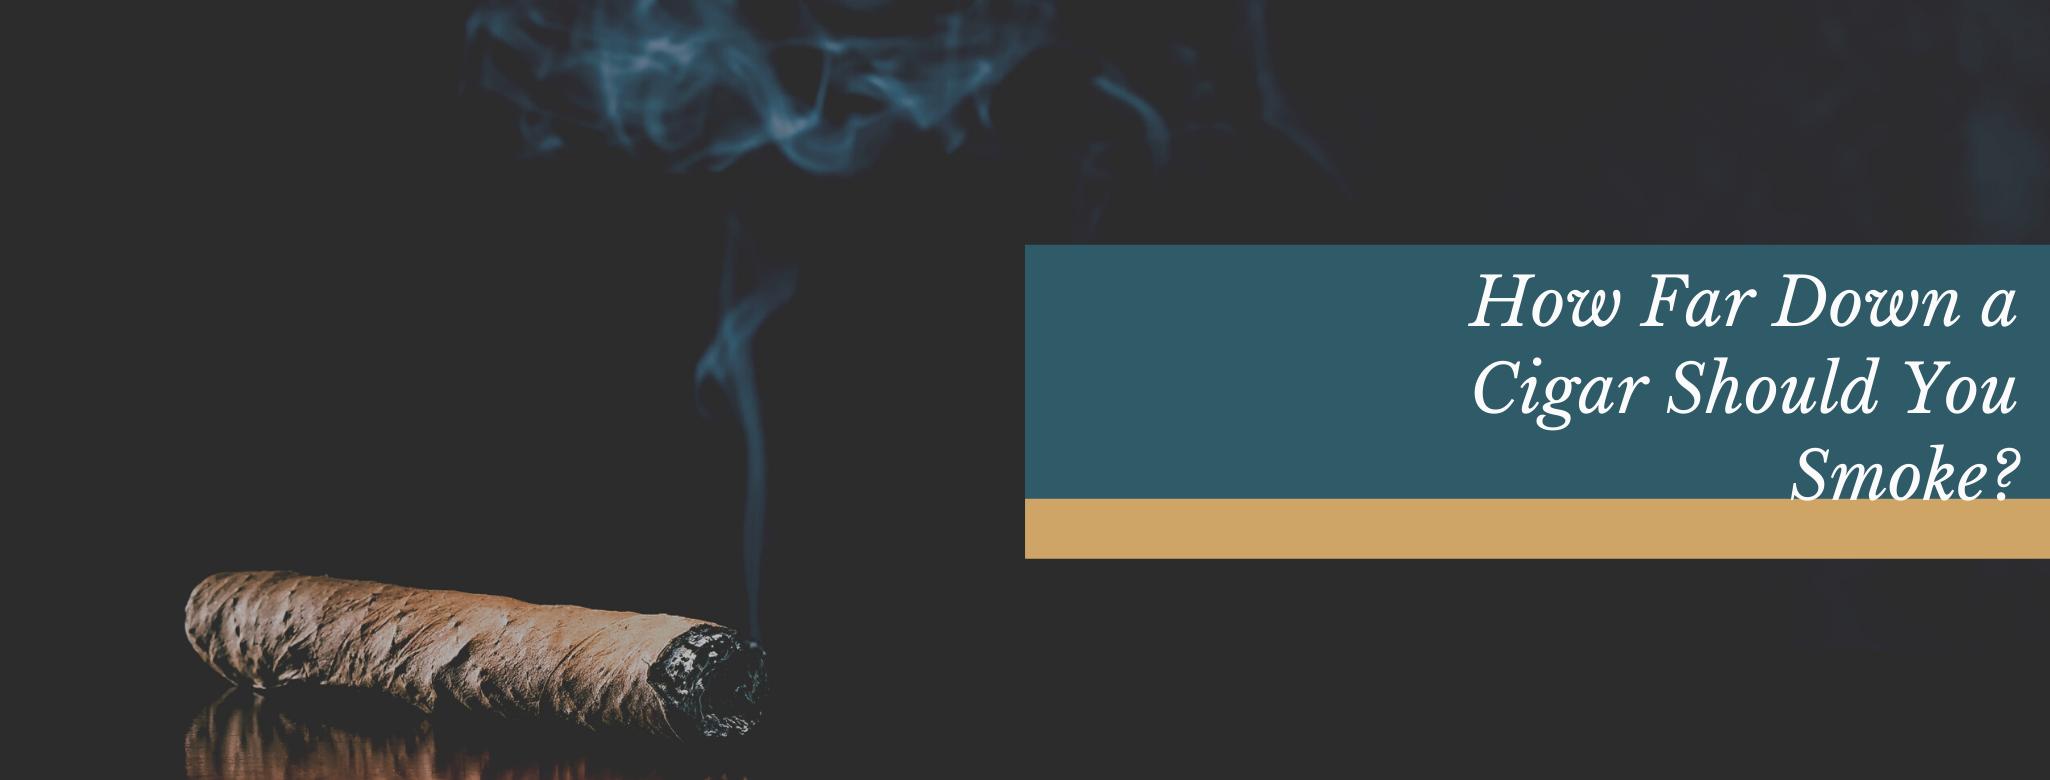 reads: how far down a cigar should you smoke?